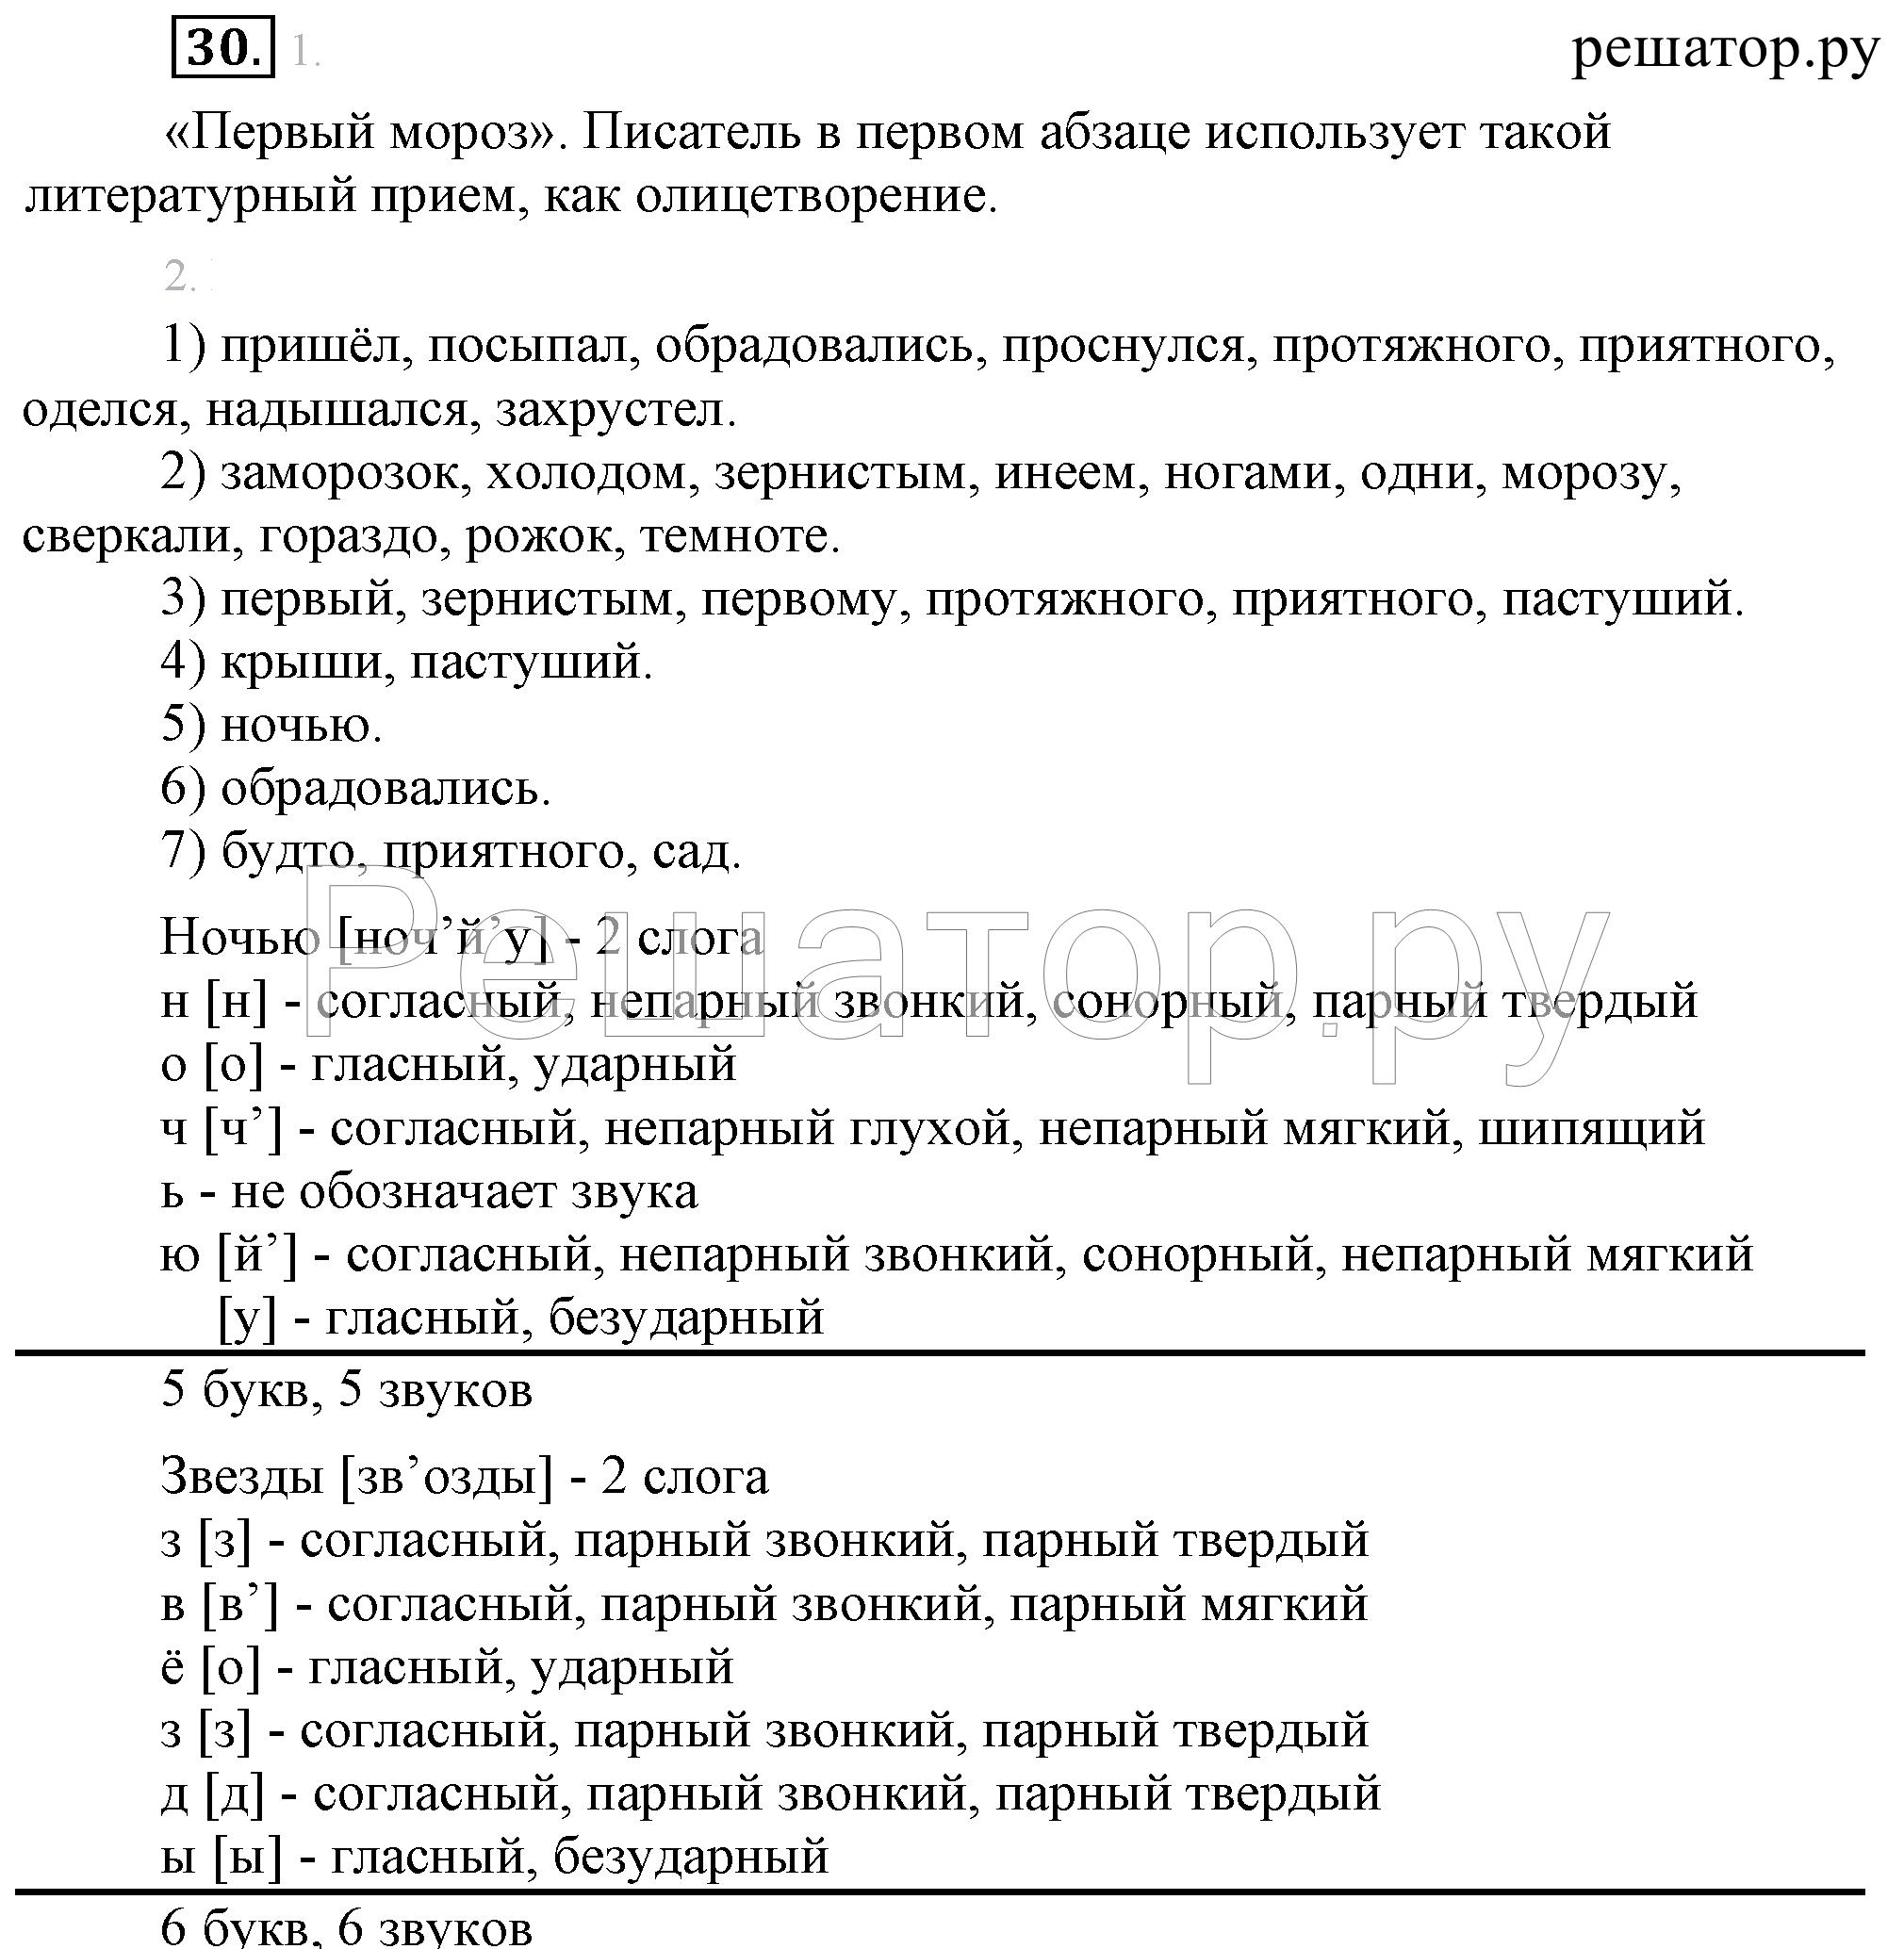 Моя домашка 4 класс русский язык бунеев онлайн